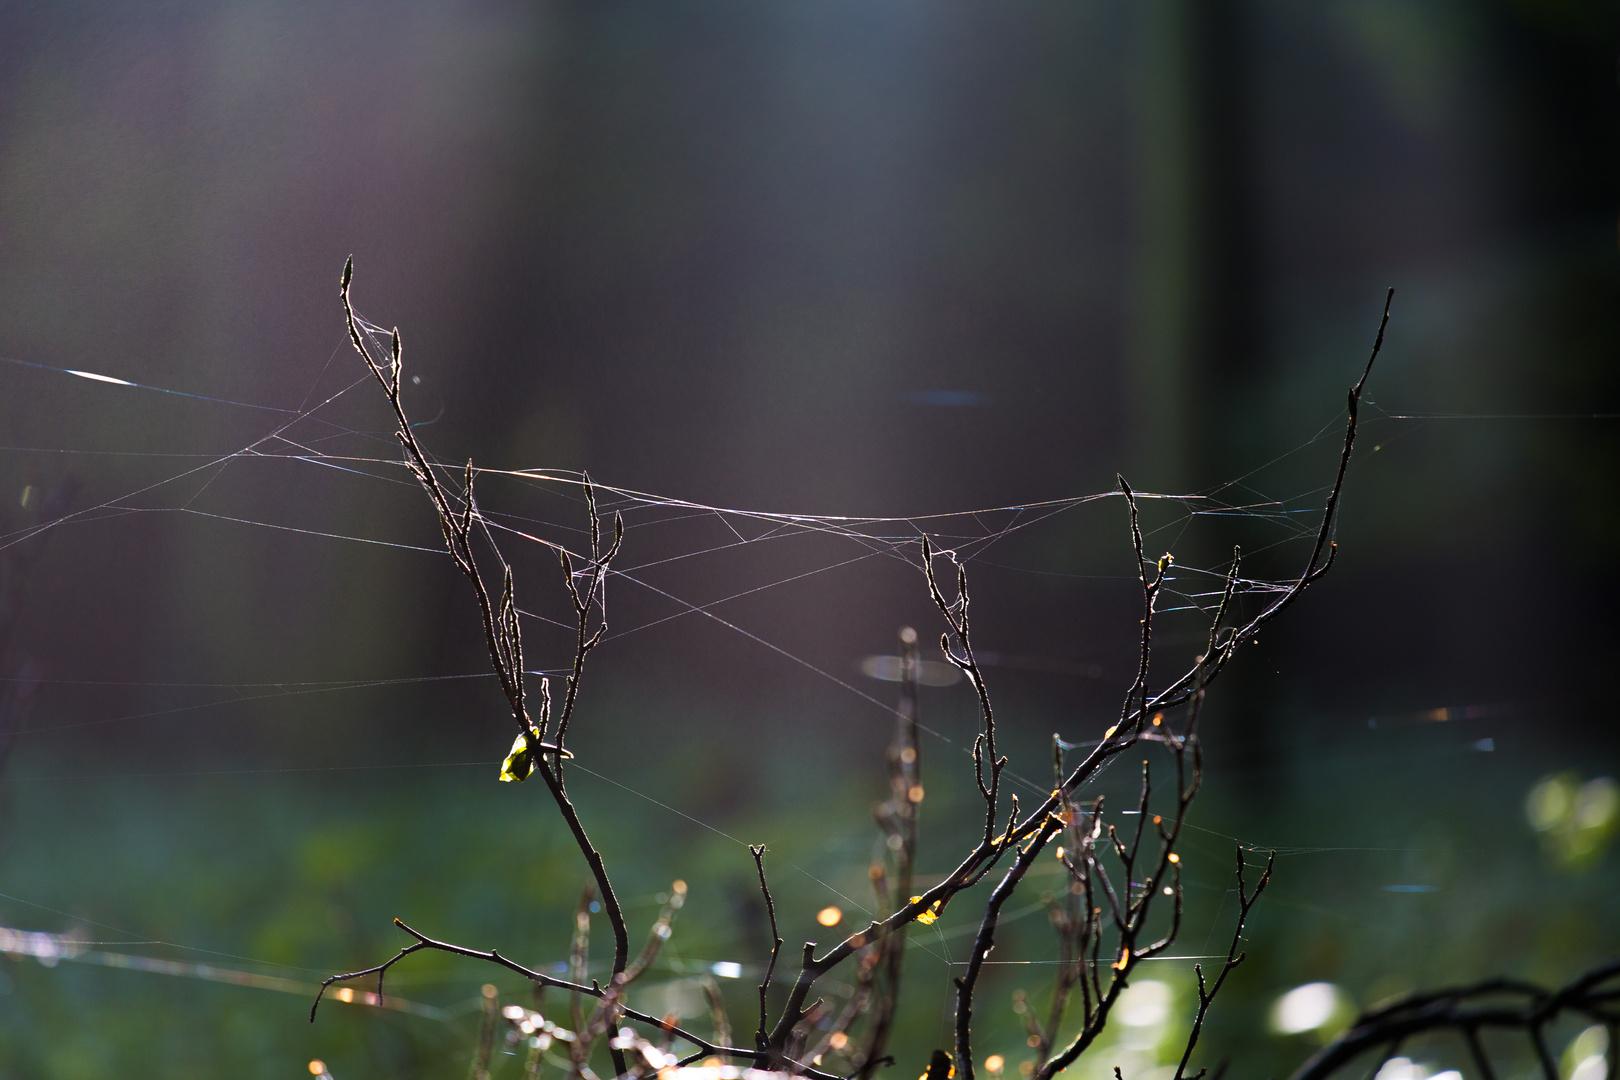 Spinnenweben, brrrrr